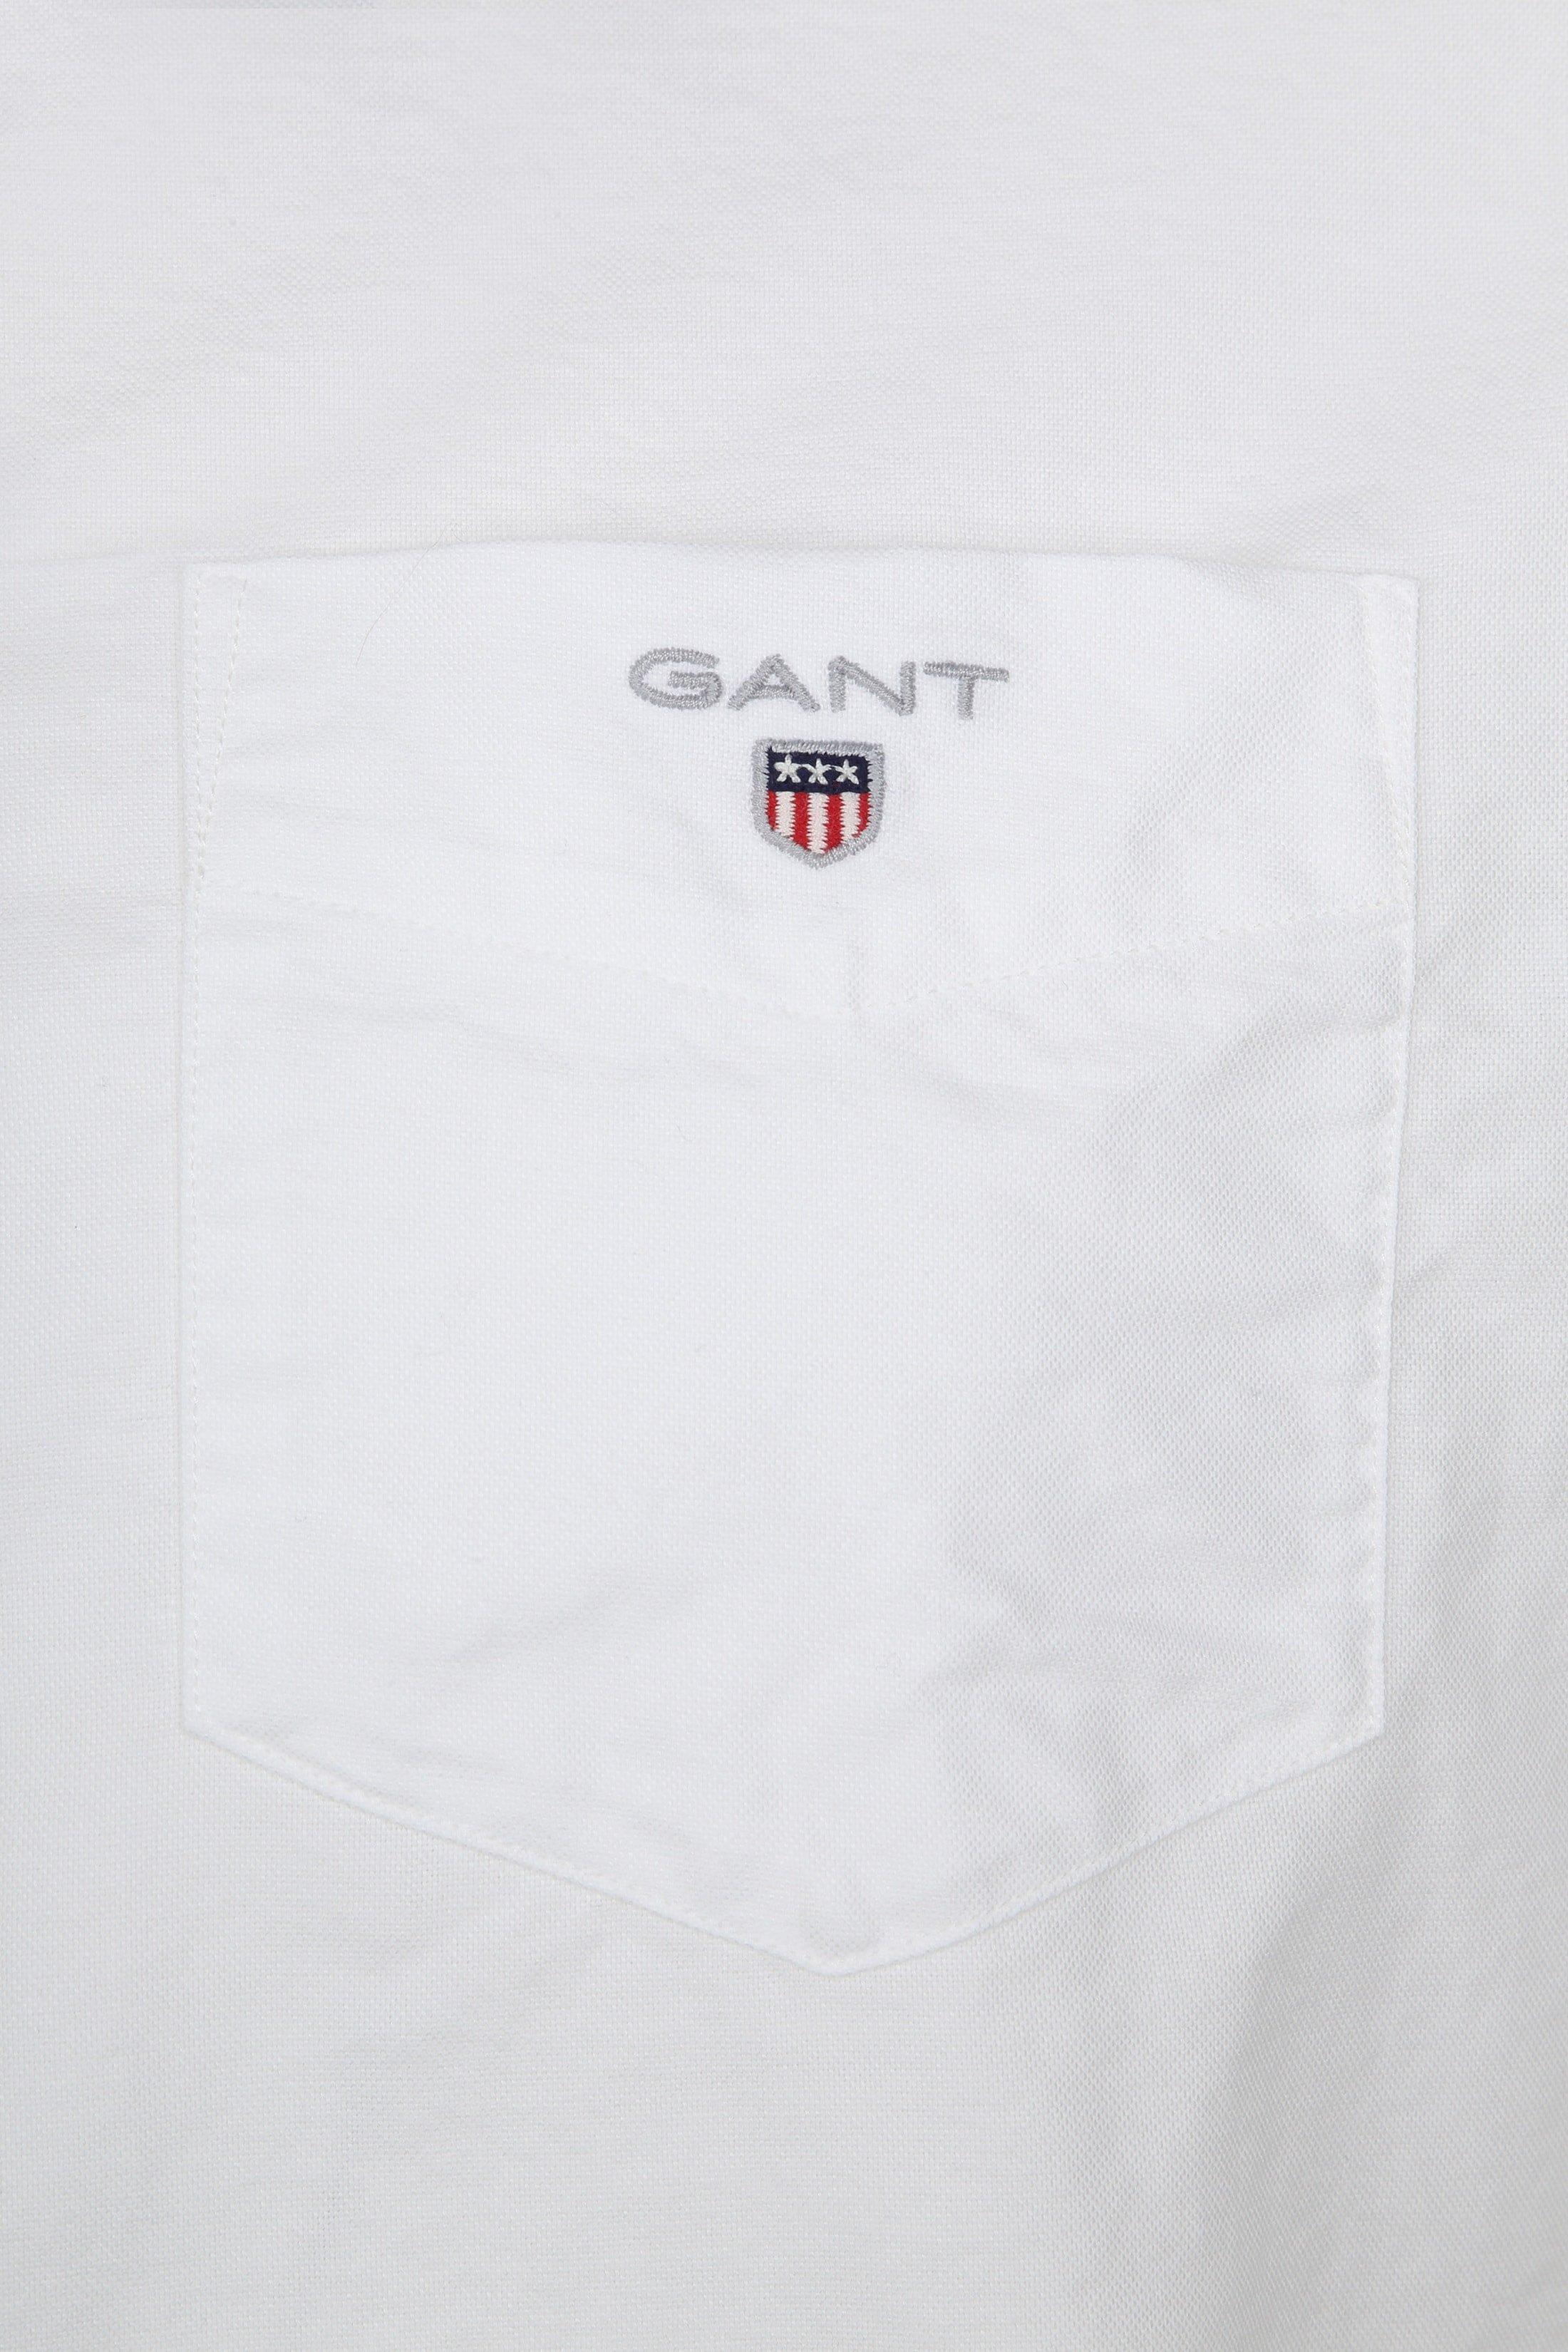 Gant Casual Hemd Oxford Wit